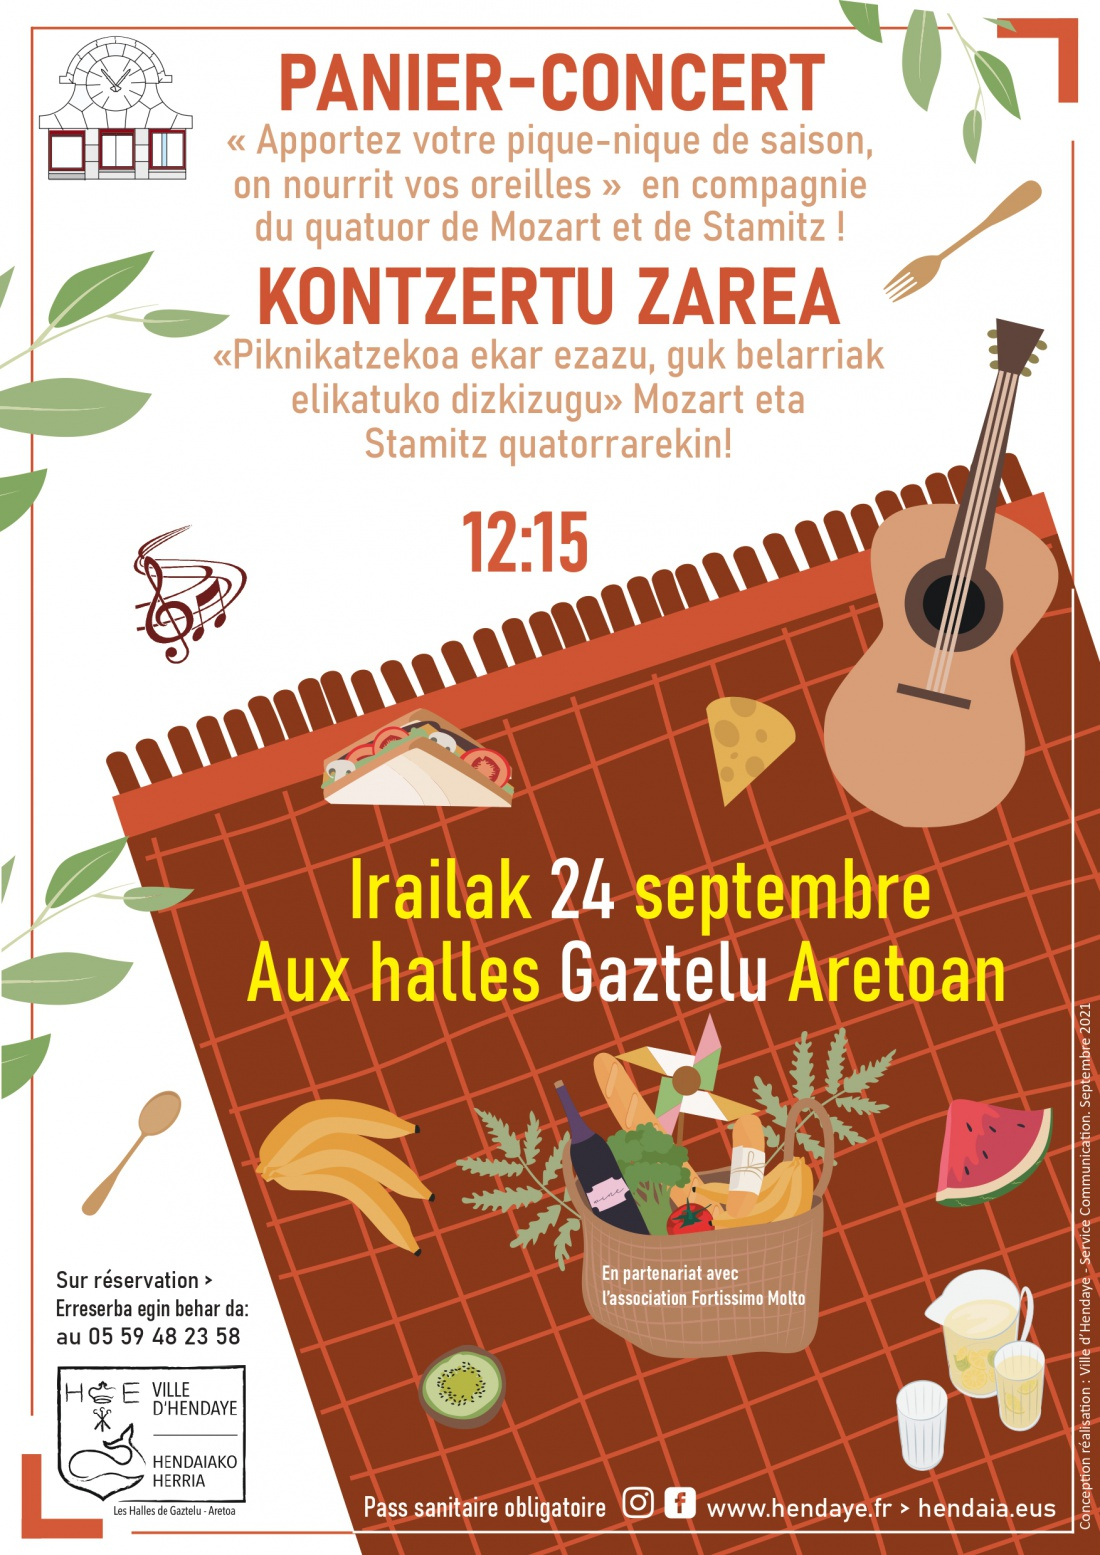 Panier-concert